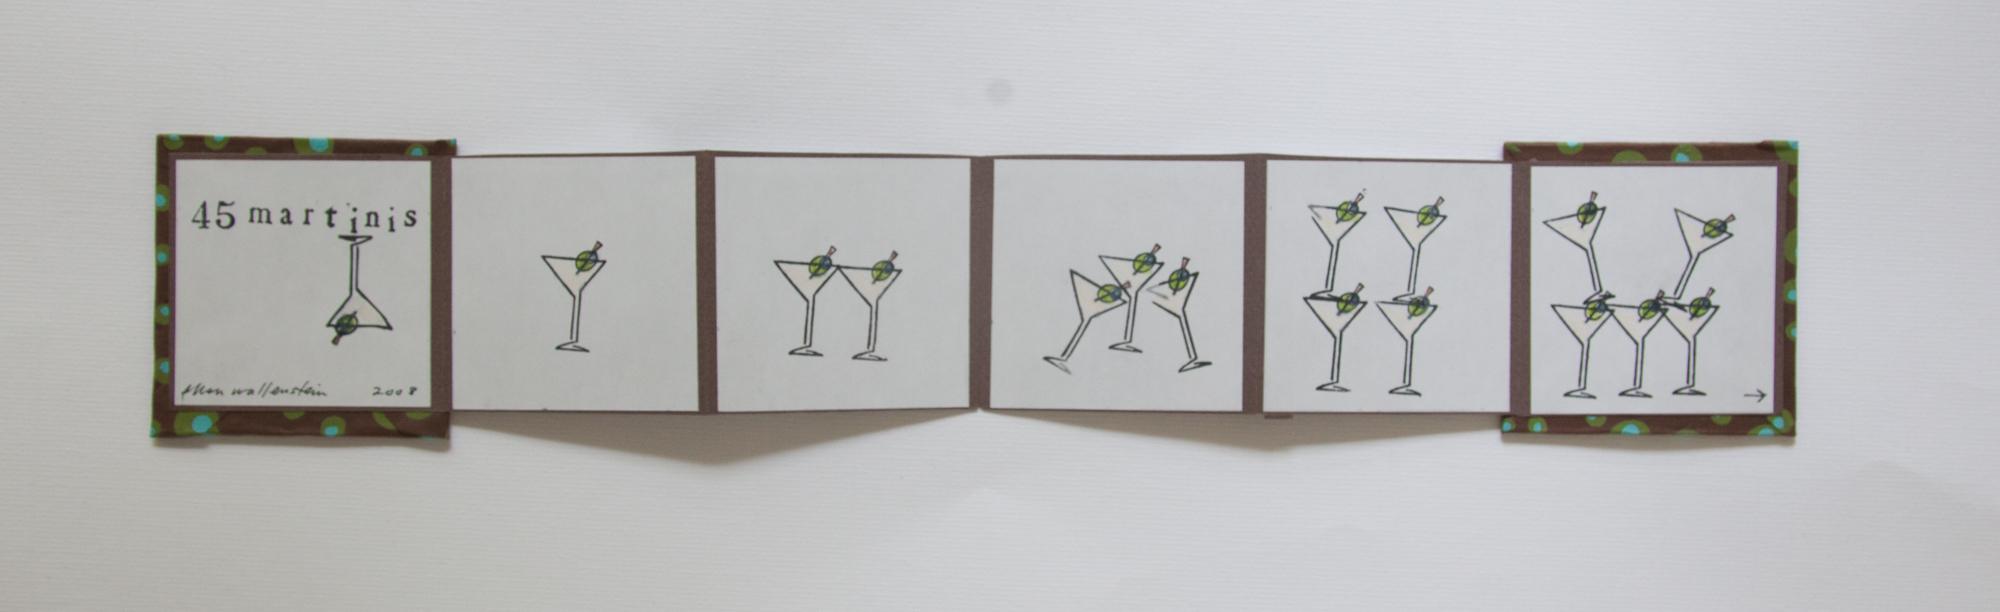 102_45 Martinis (2008)_.jpg